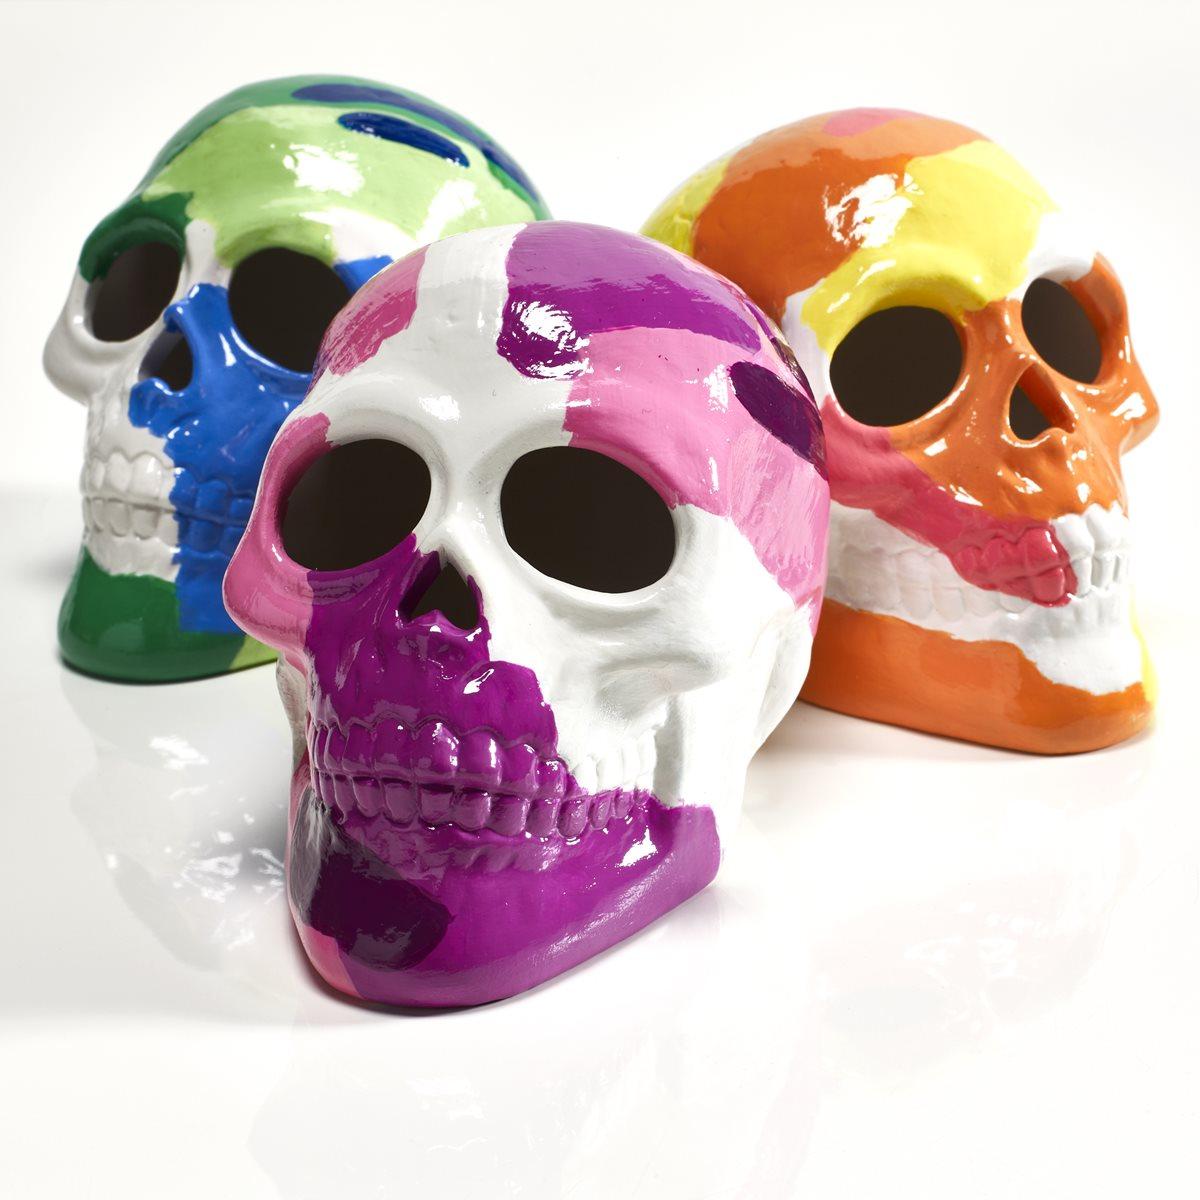 FolkArt Glossy Poured Skulls & Wood Vase